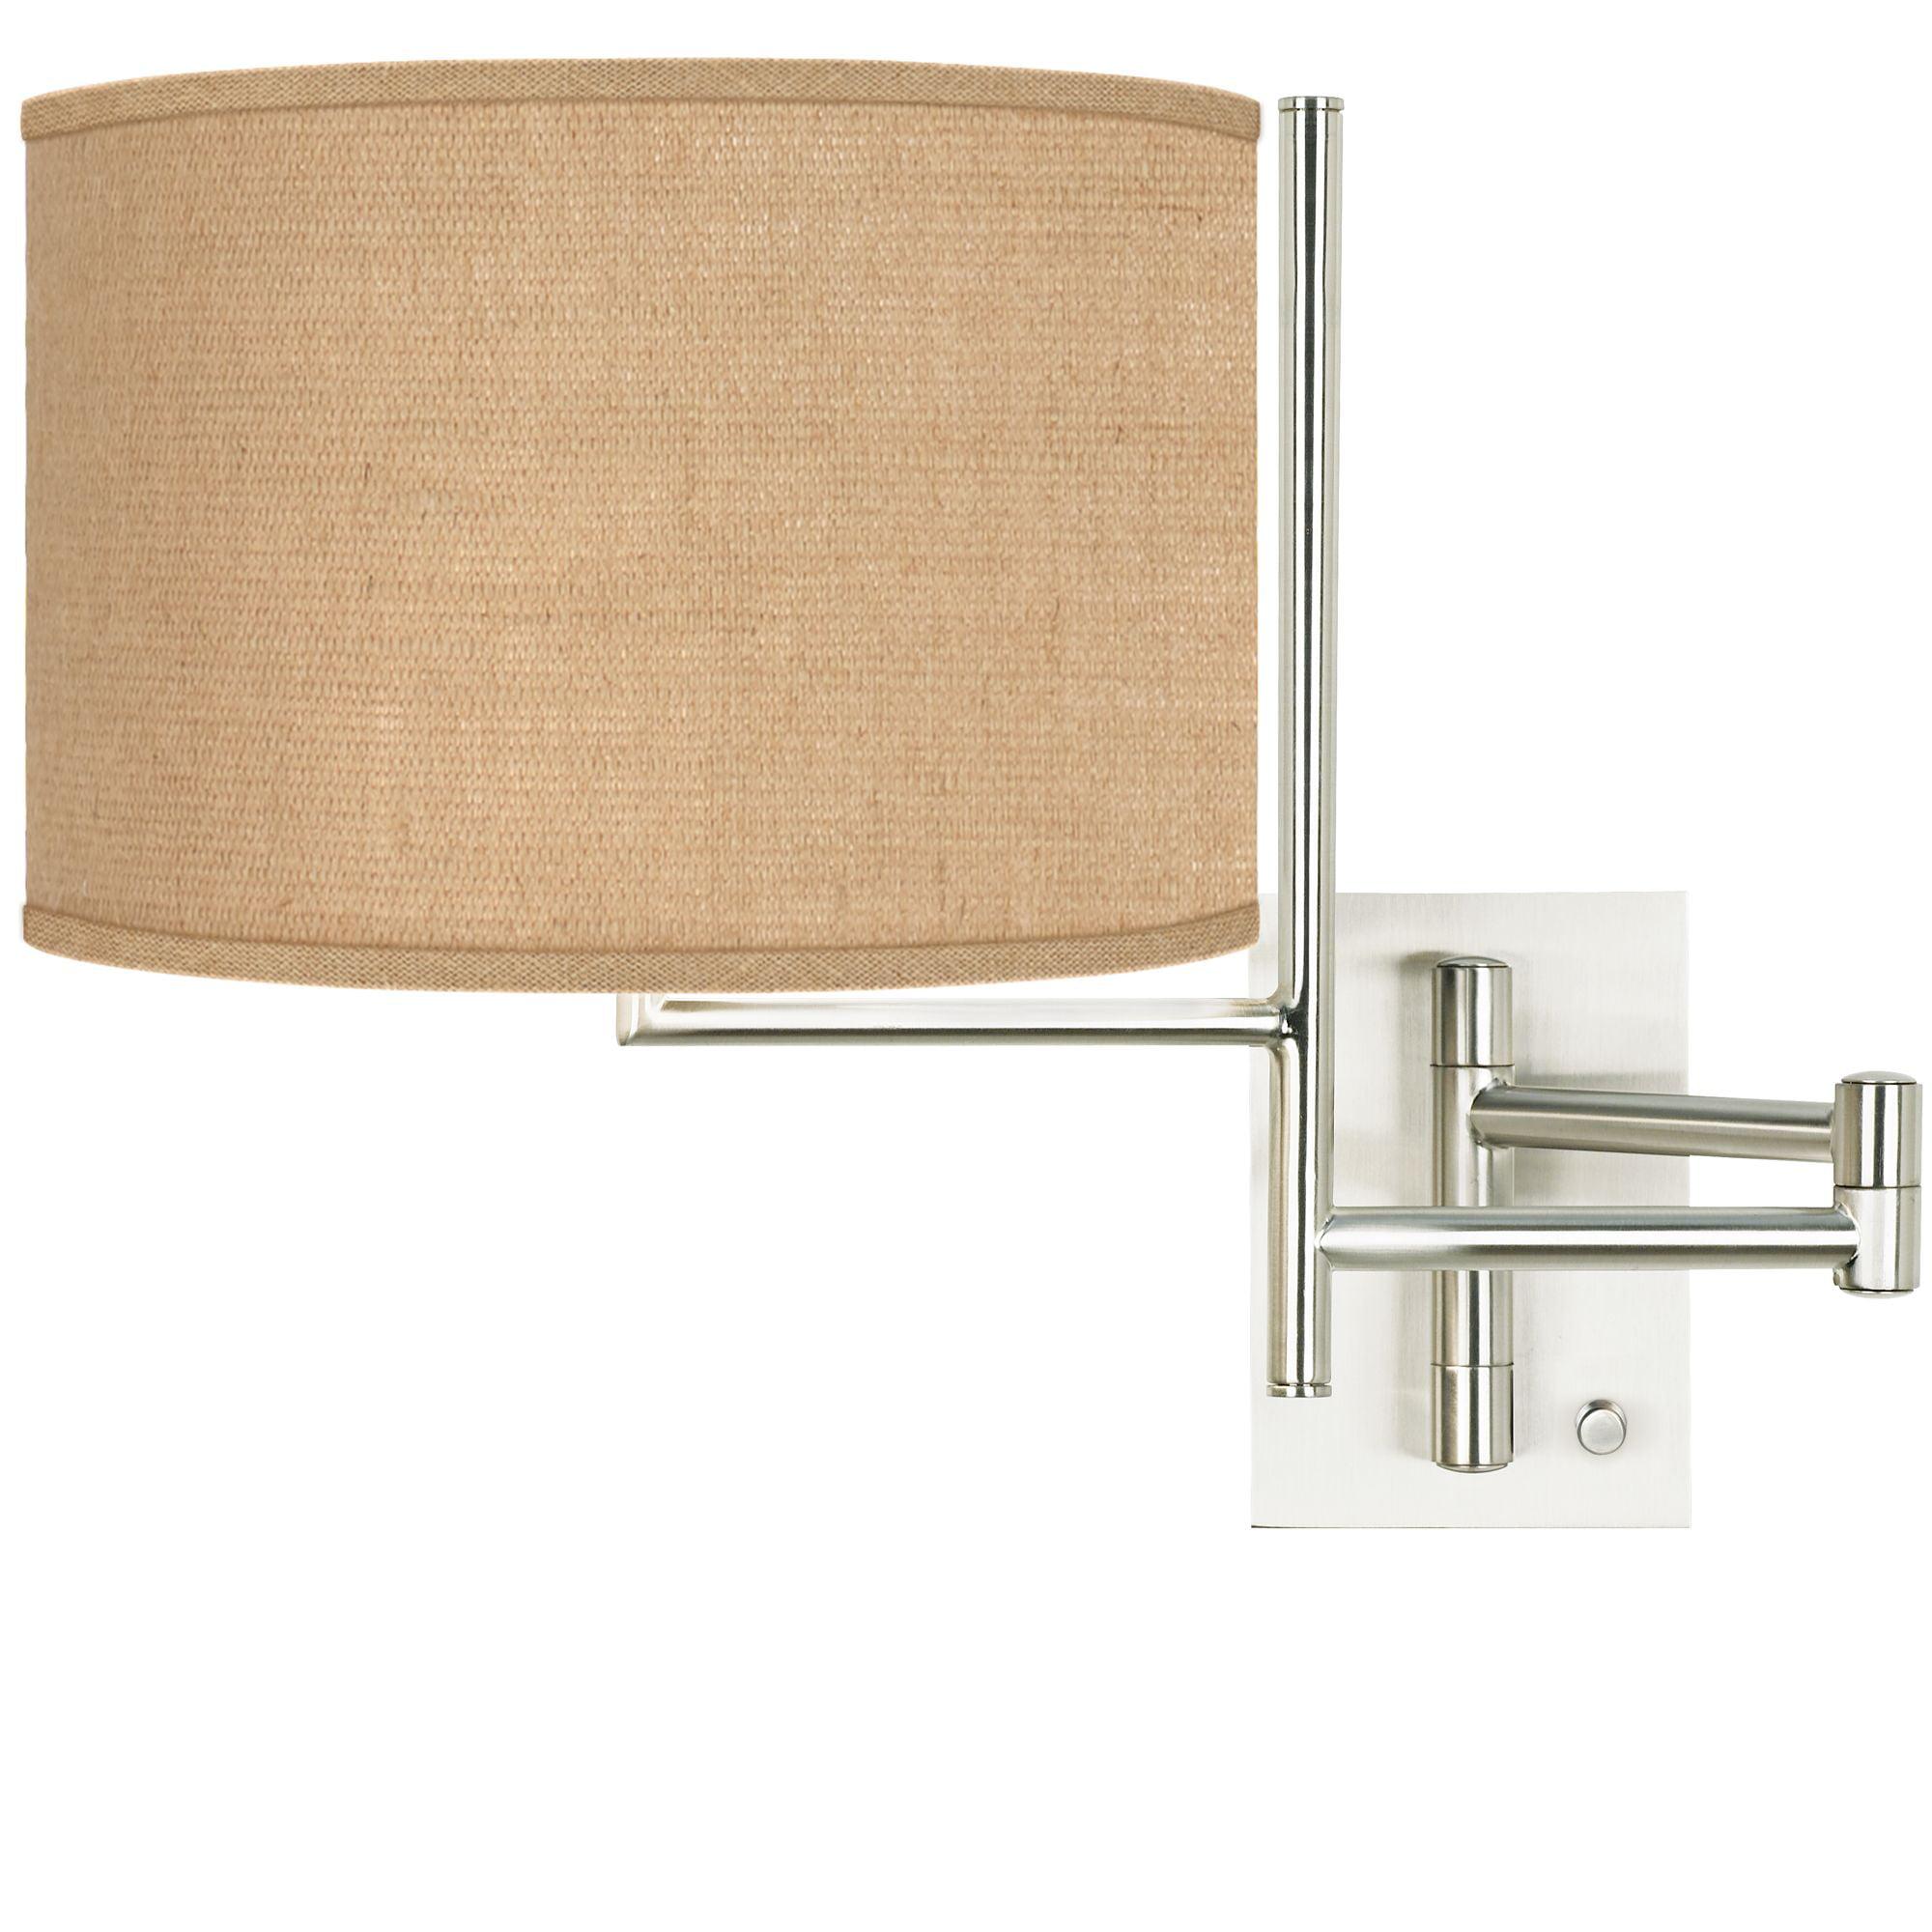 Possini Euro Design Modern Swing Arm Wall Lamp Brushed Nickel Plug In Light Fixture Woven Burlap Fabric Drum Shade Bedroom Bedside Walmart Com Walmart Com